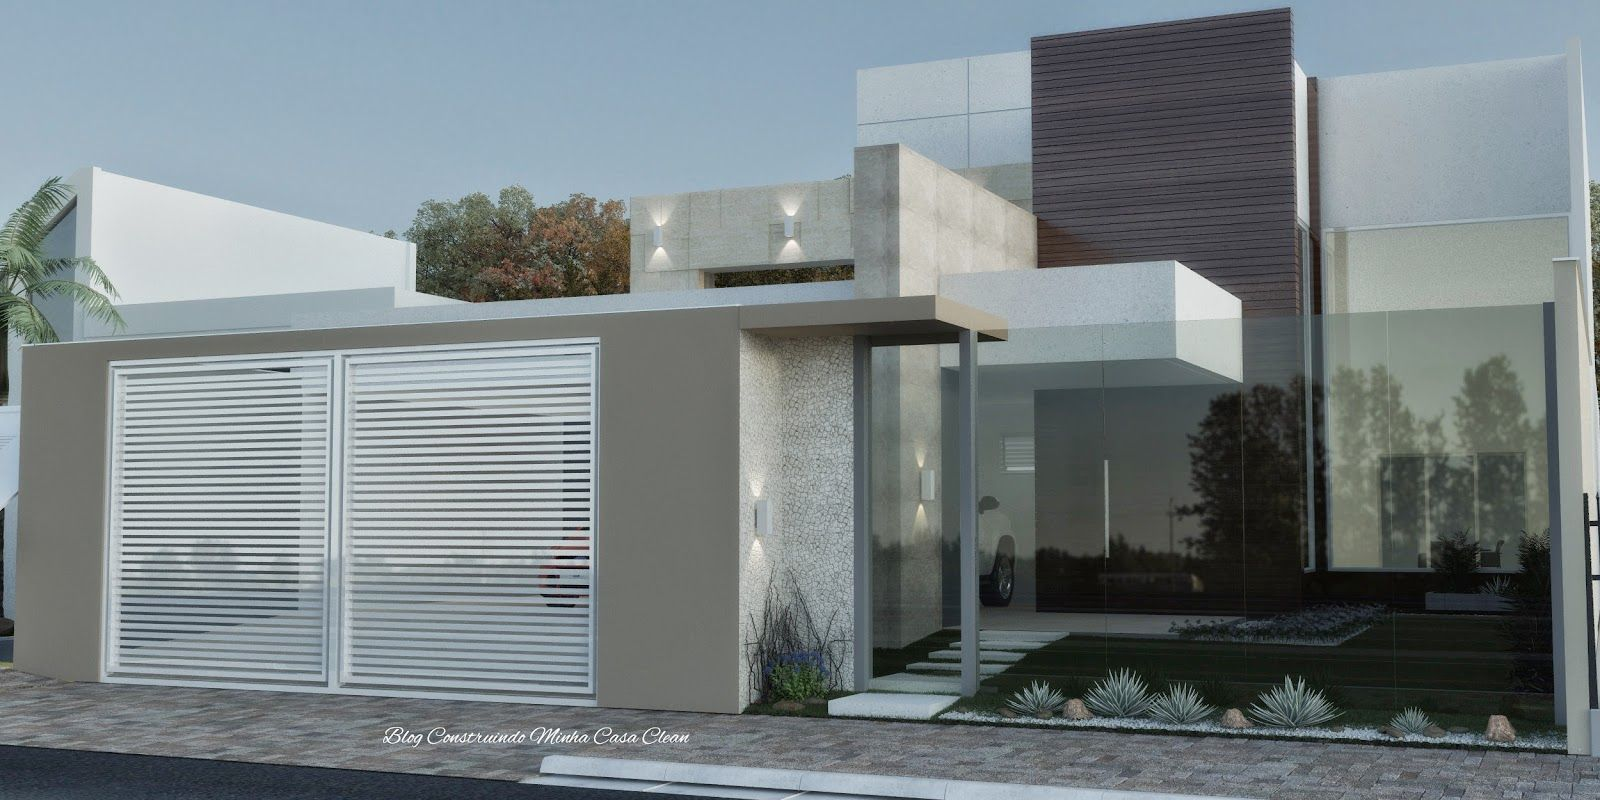 casas modernas com vidro e madeira - Buscar con Google